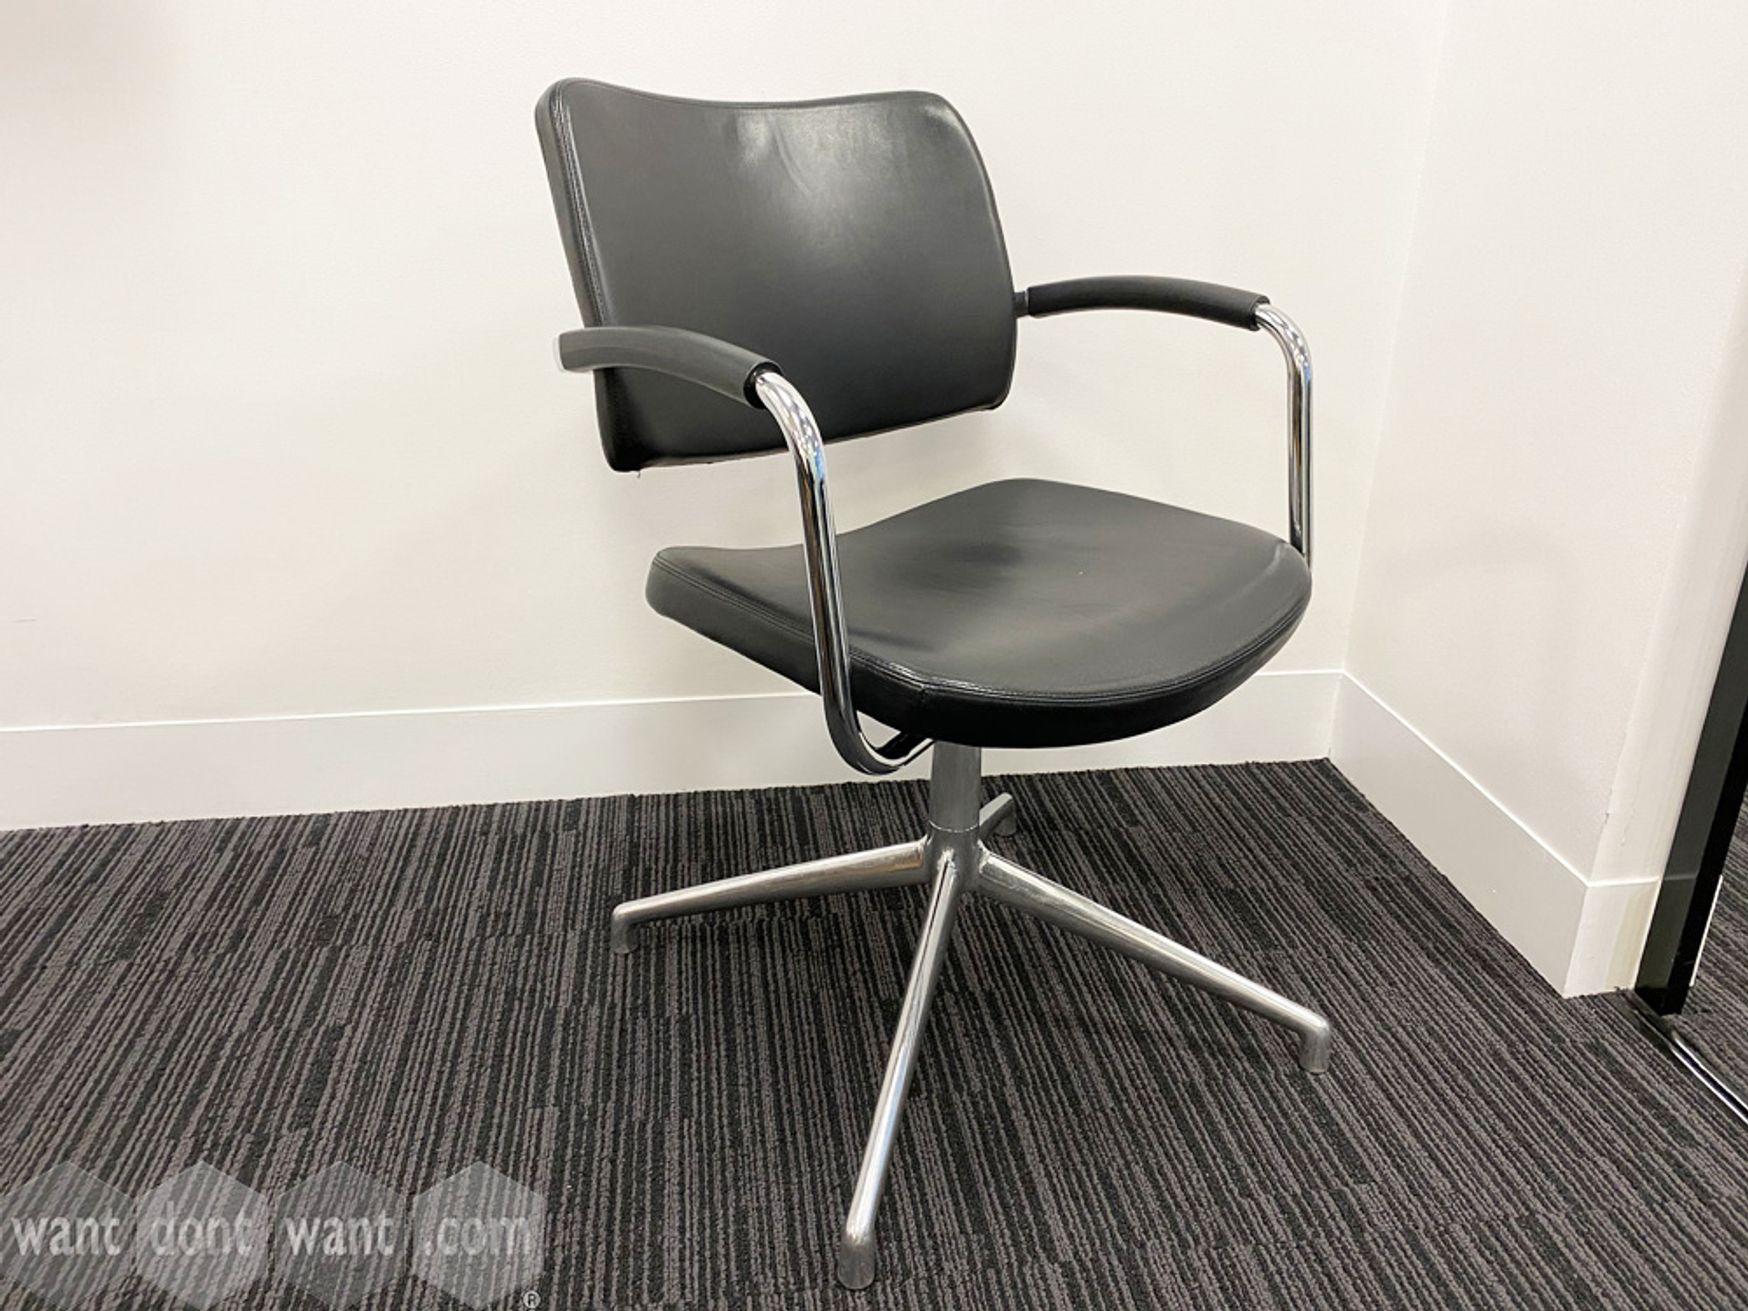 Used Boss Design Pro 4-star swivel meeting chairs